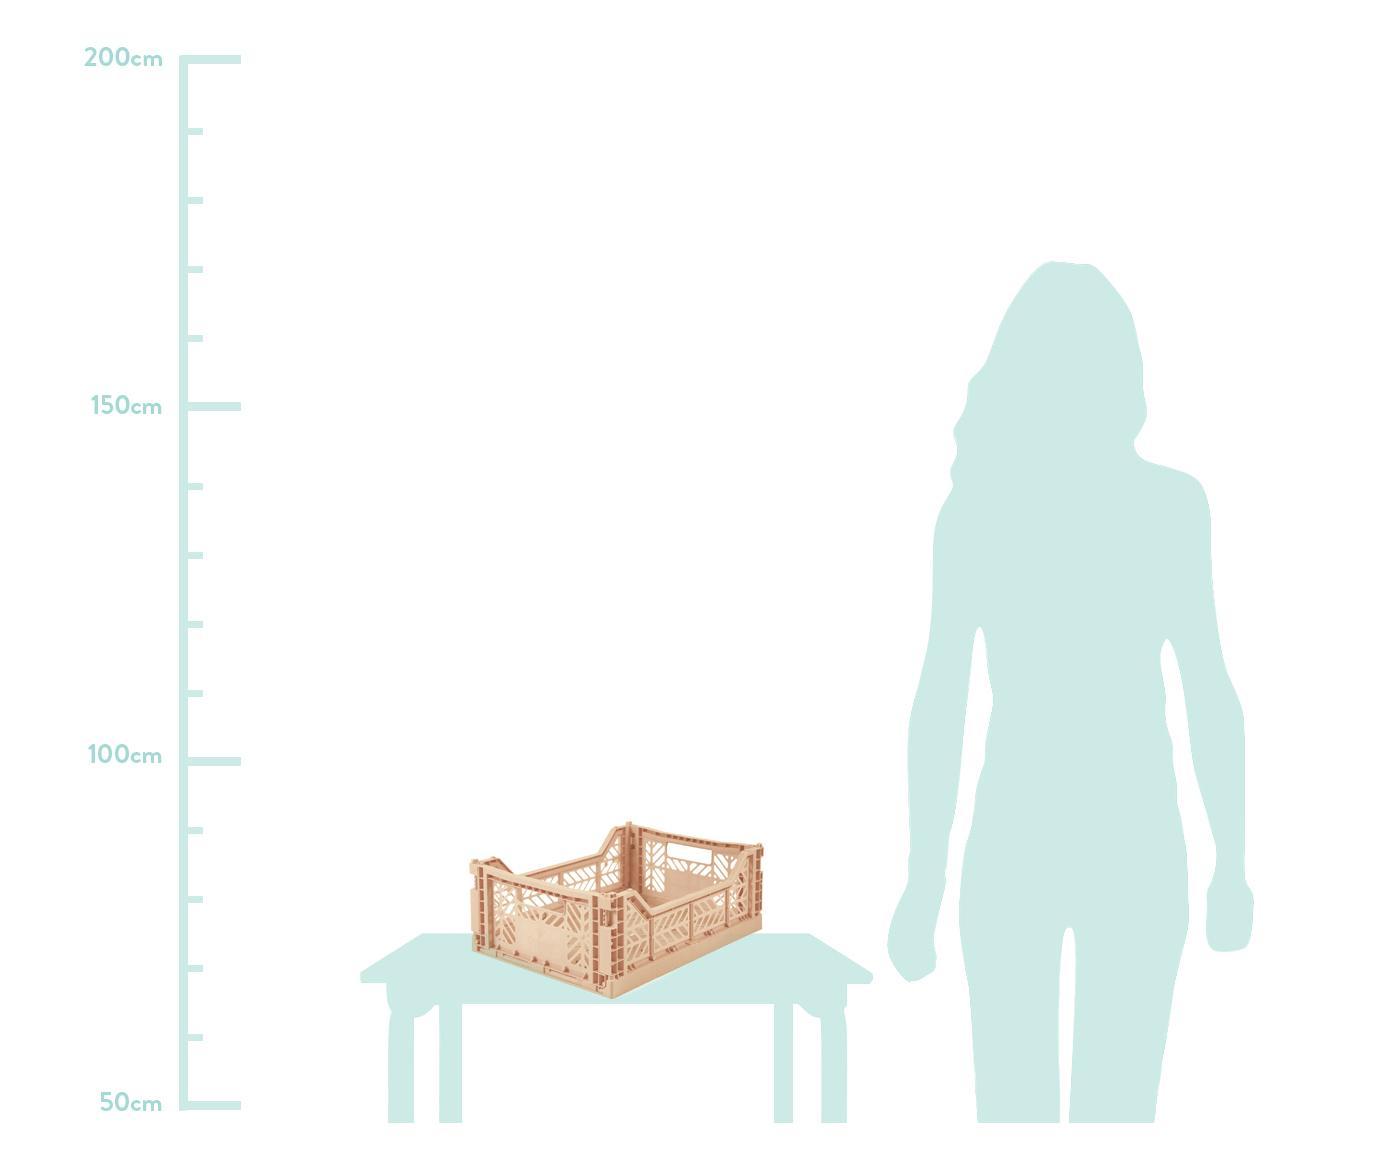 Cesto medio pieghevole e impilabile Milk Tea, Materiale sintetico riciclato, Beige, Larg. 40 x Alt. 14 cm